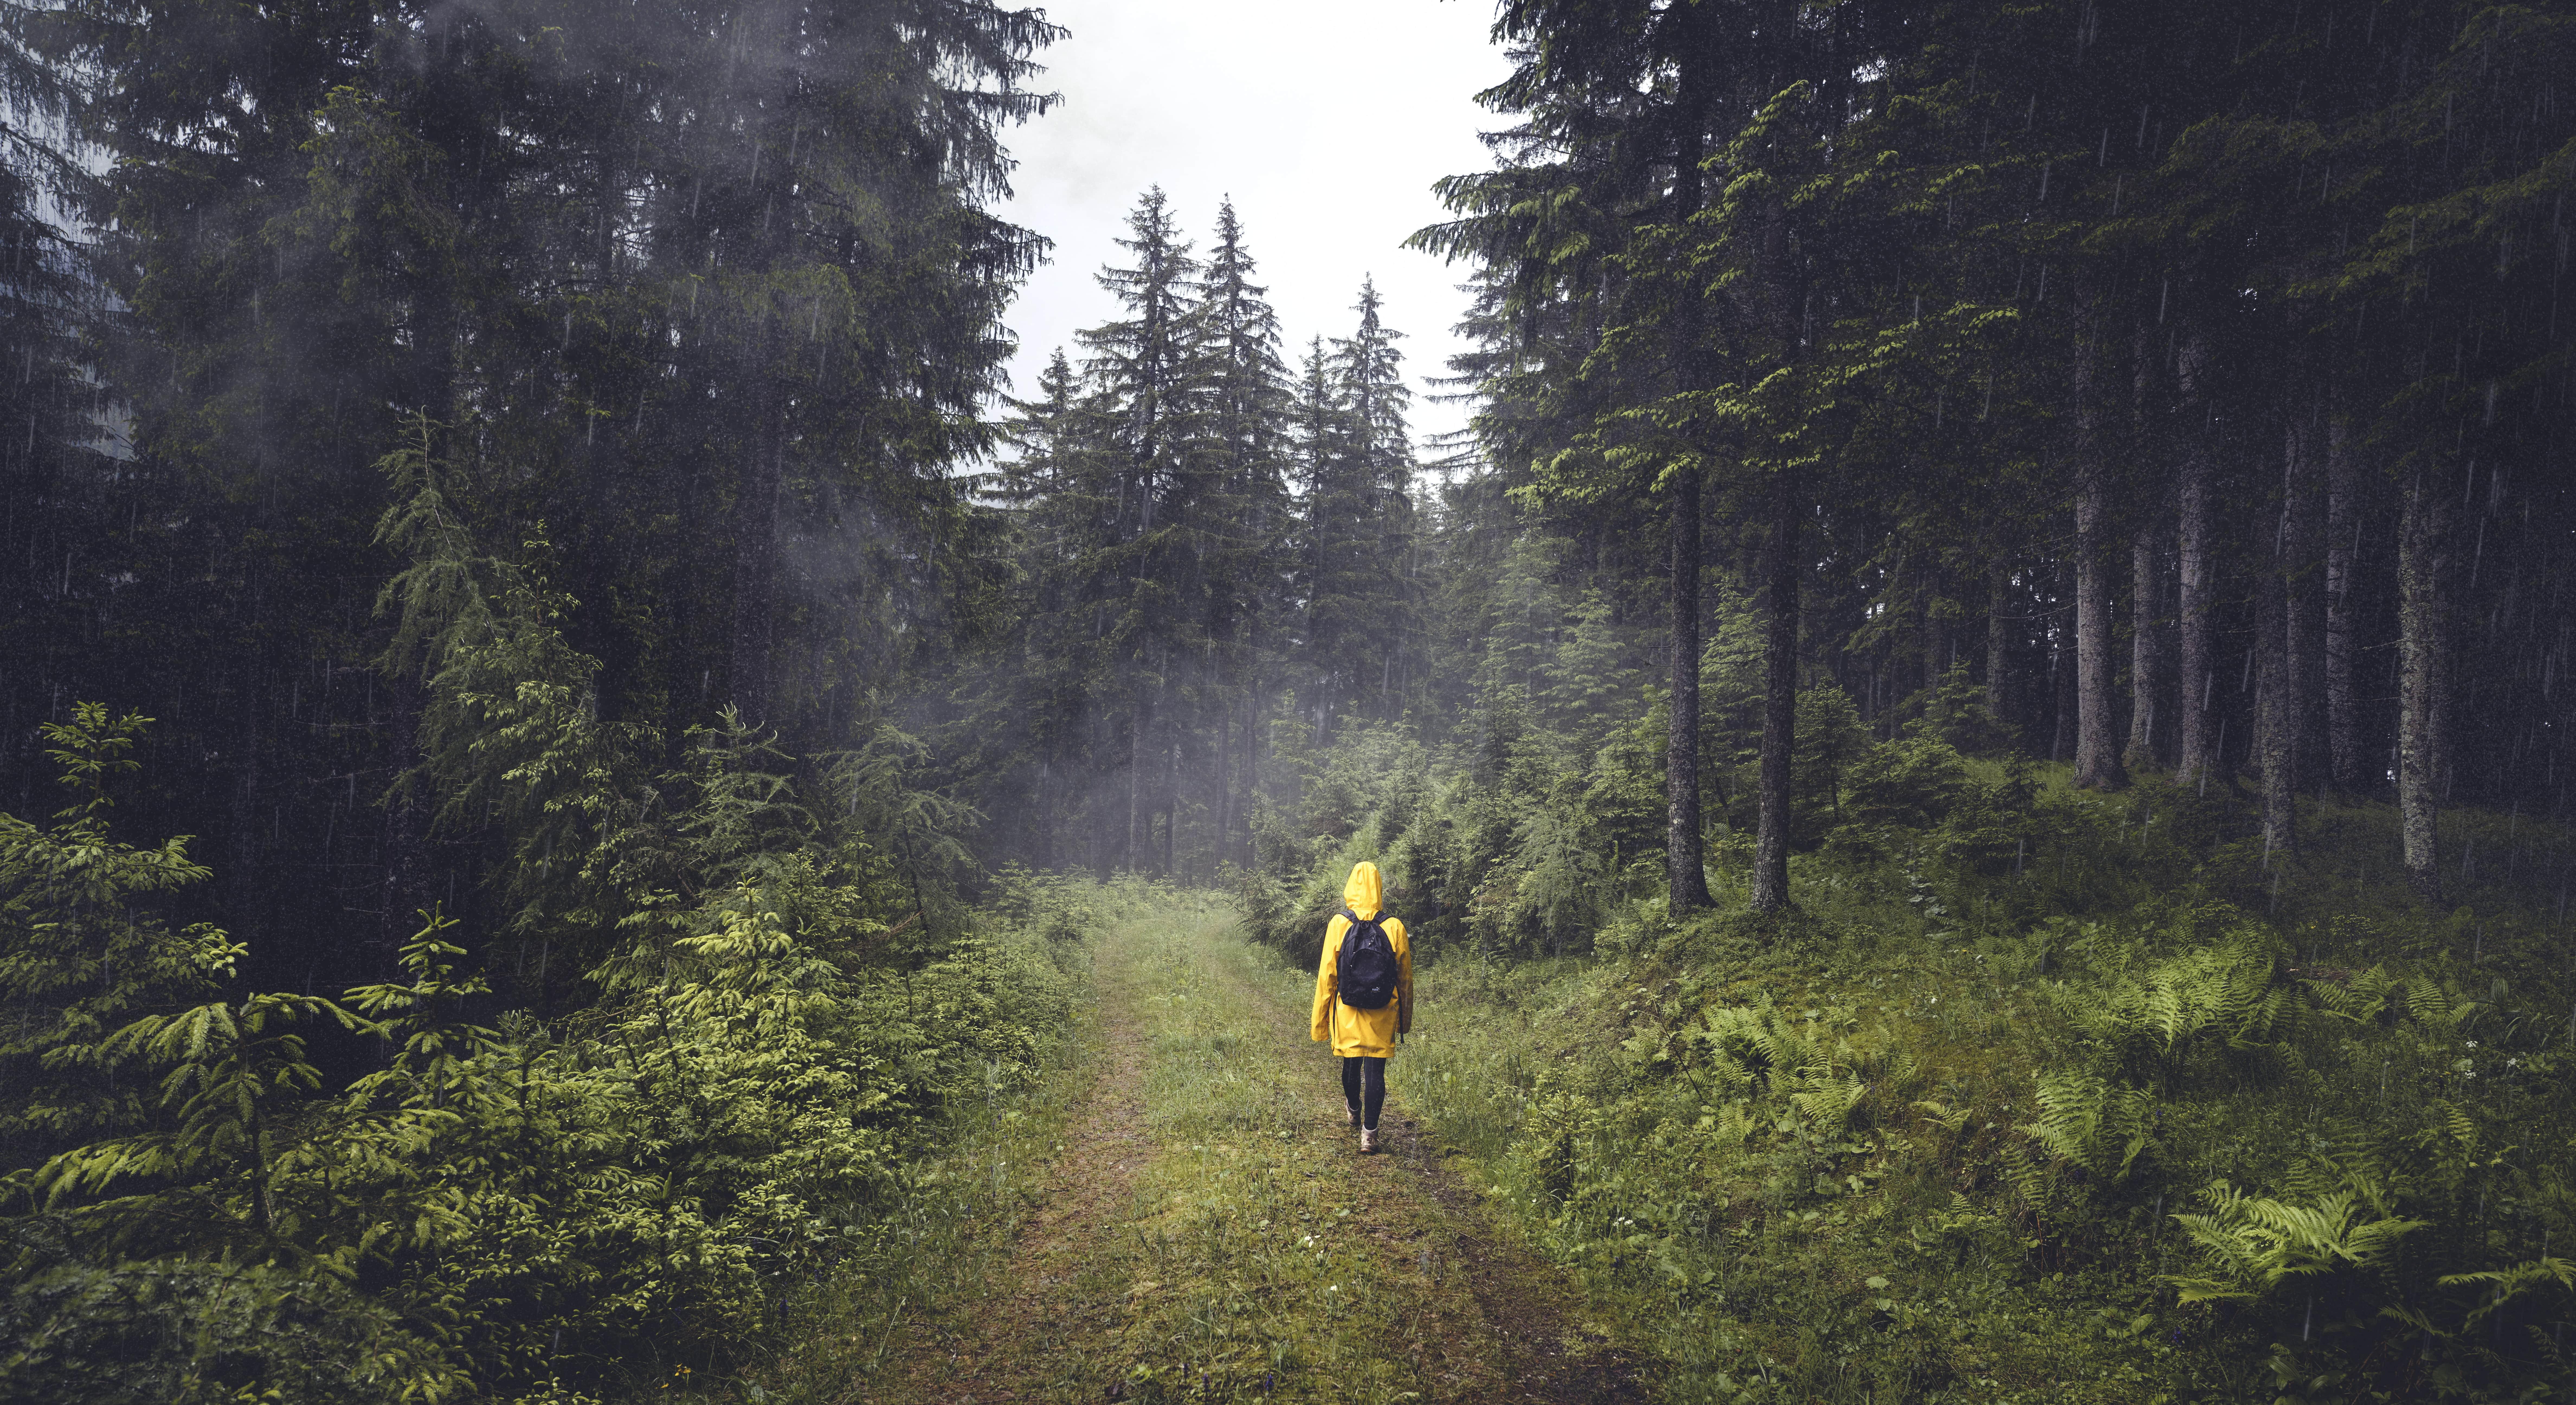 007_Nationalparks_Austria_Gesäuse©Stefan_Leitner-min